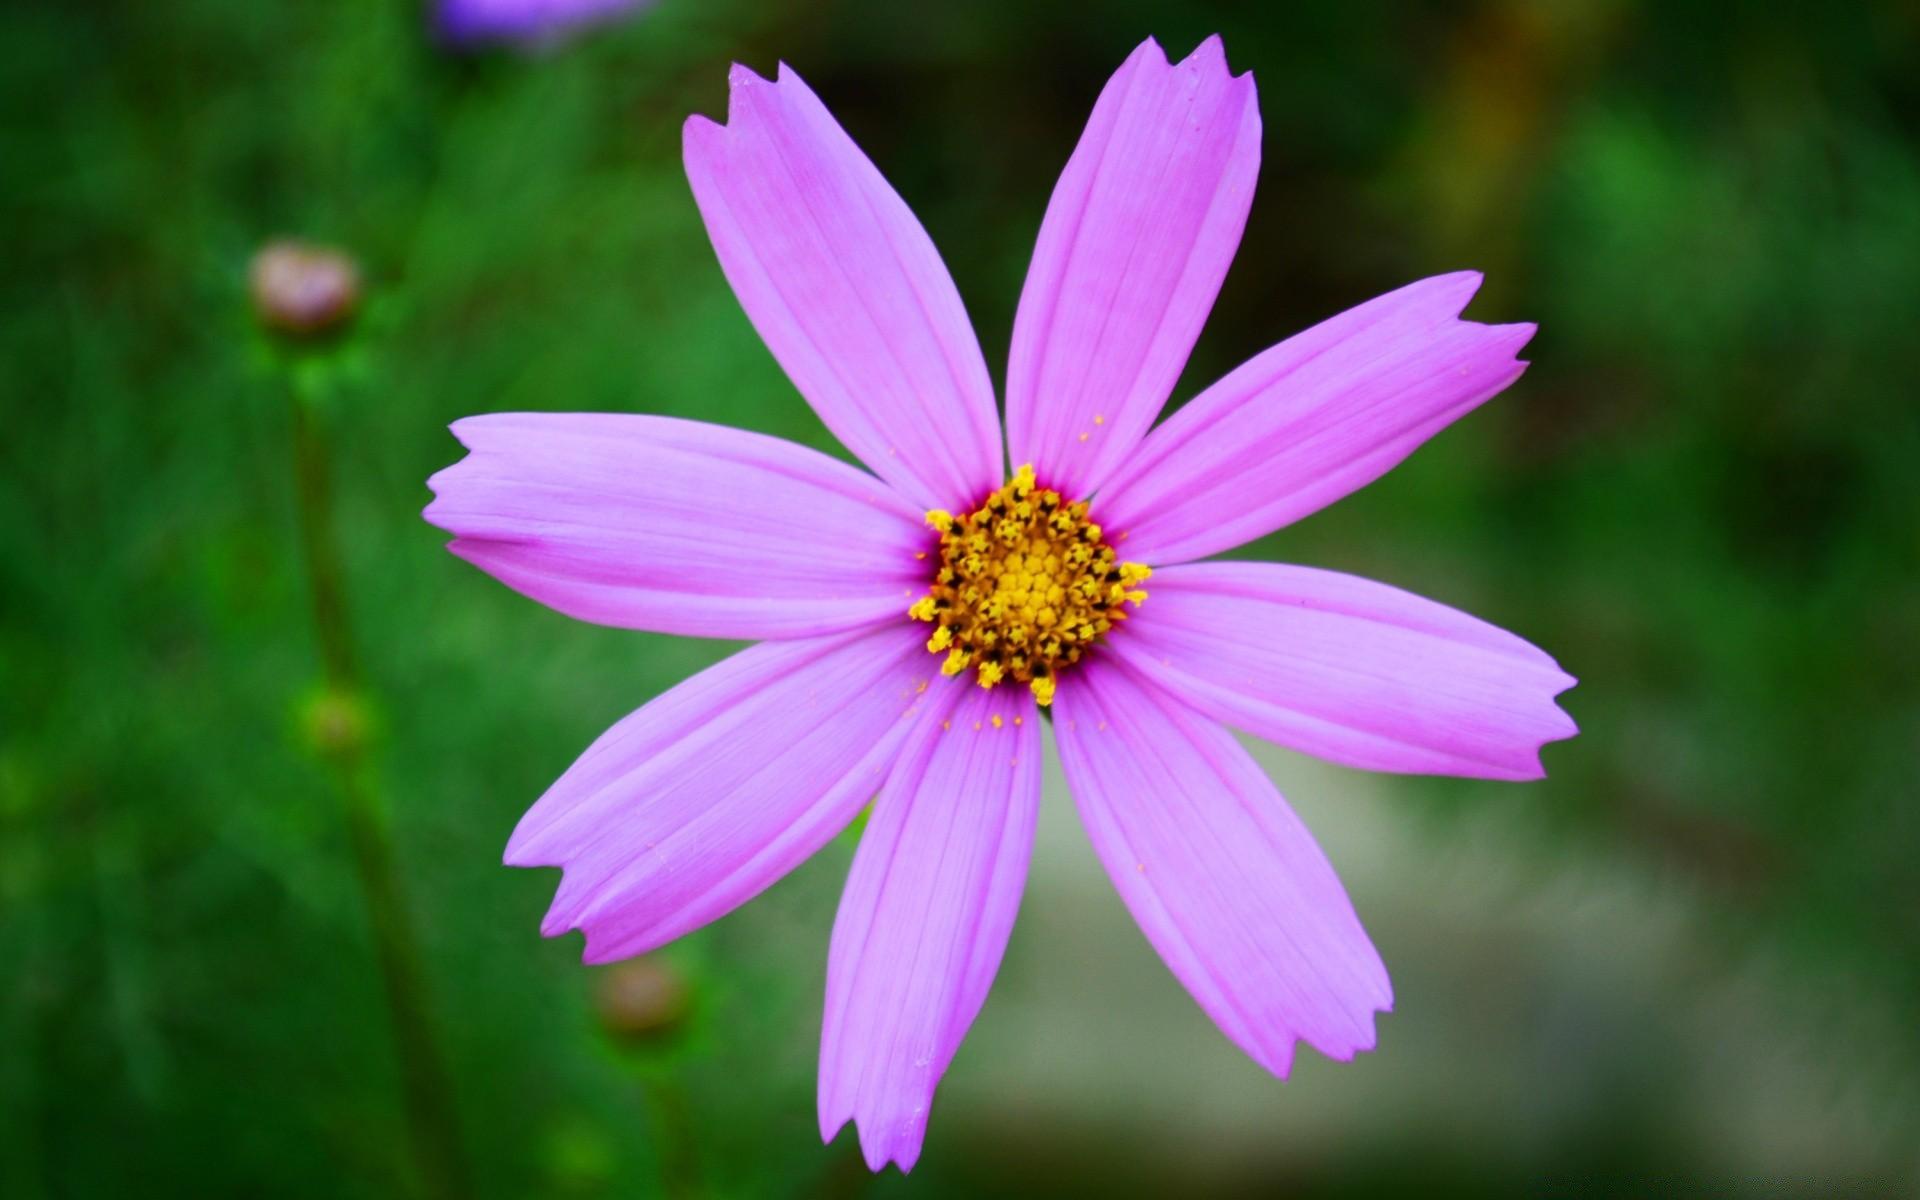 Pink Flower Desktop Wallpapers For Free